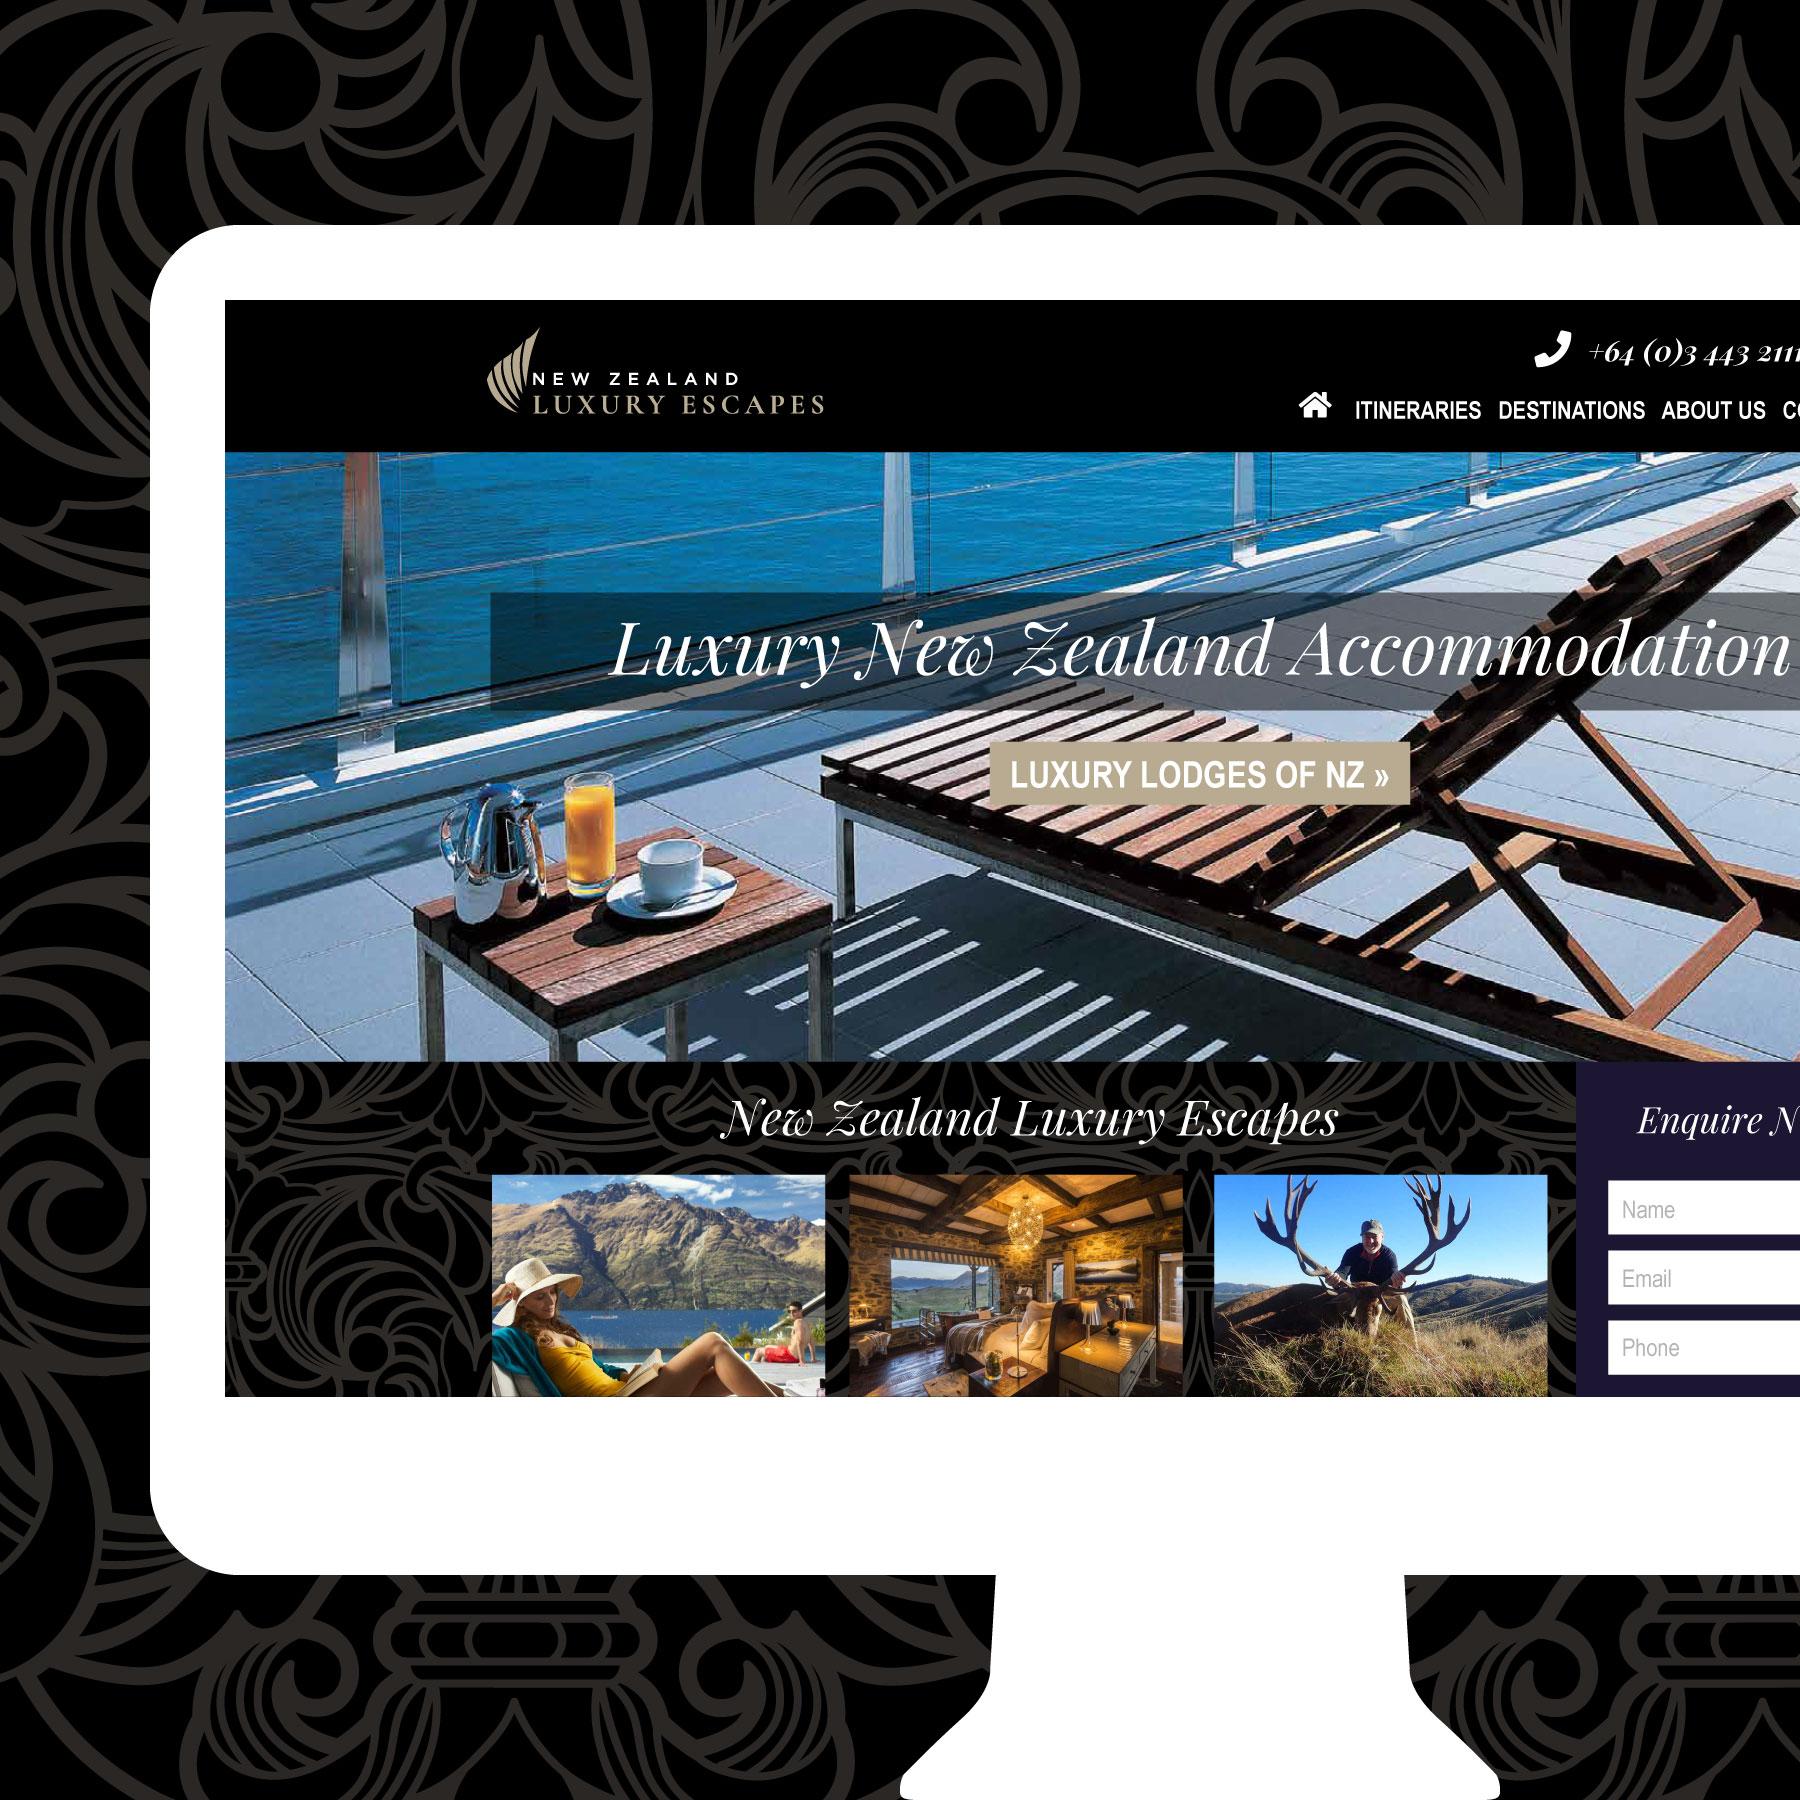 NZ Luxury Escapes Invercargill Web Design